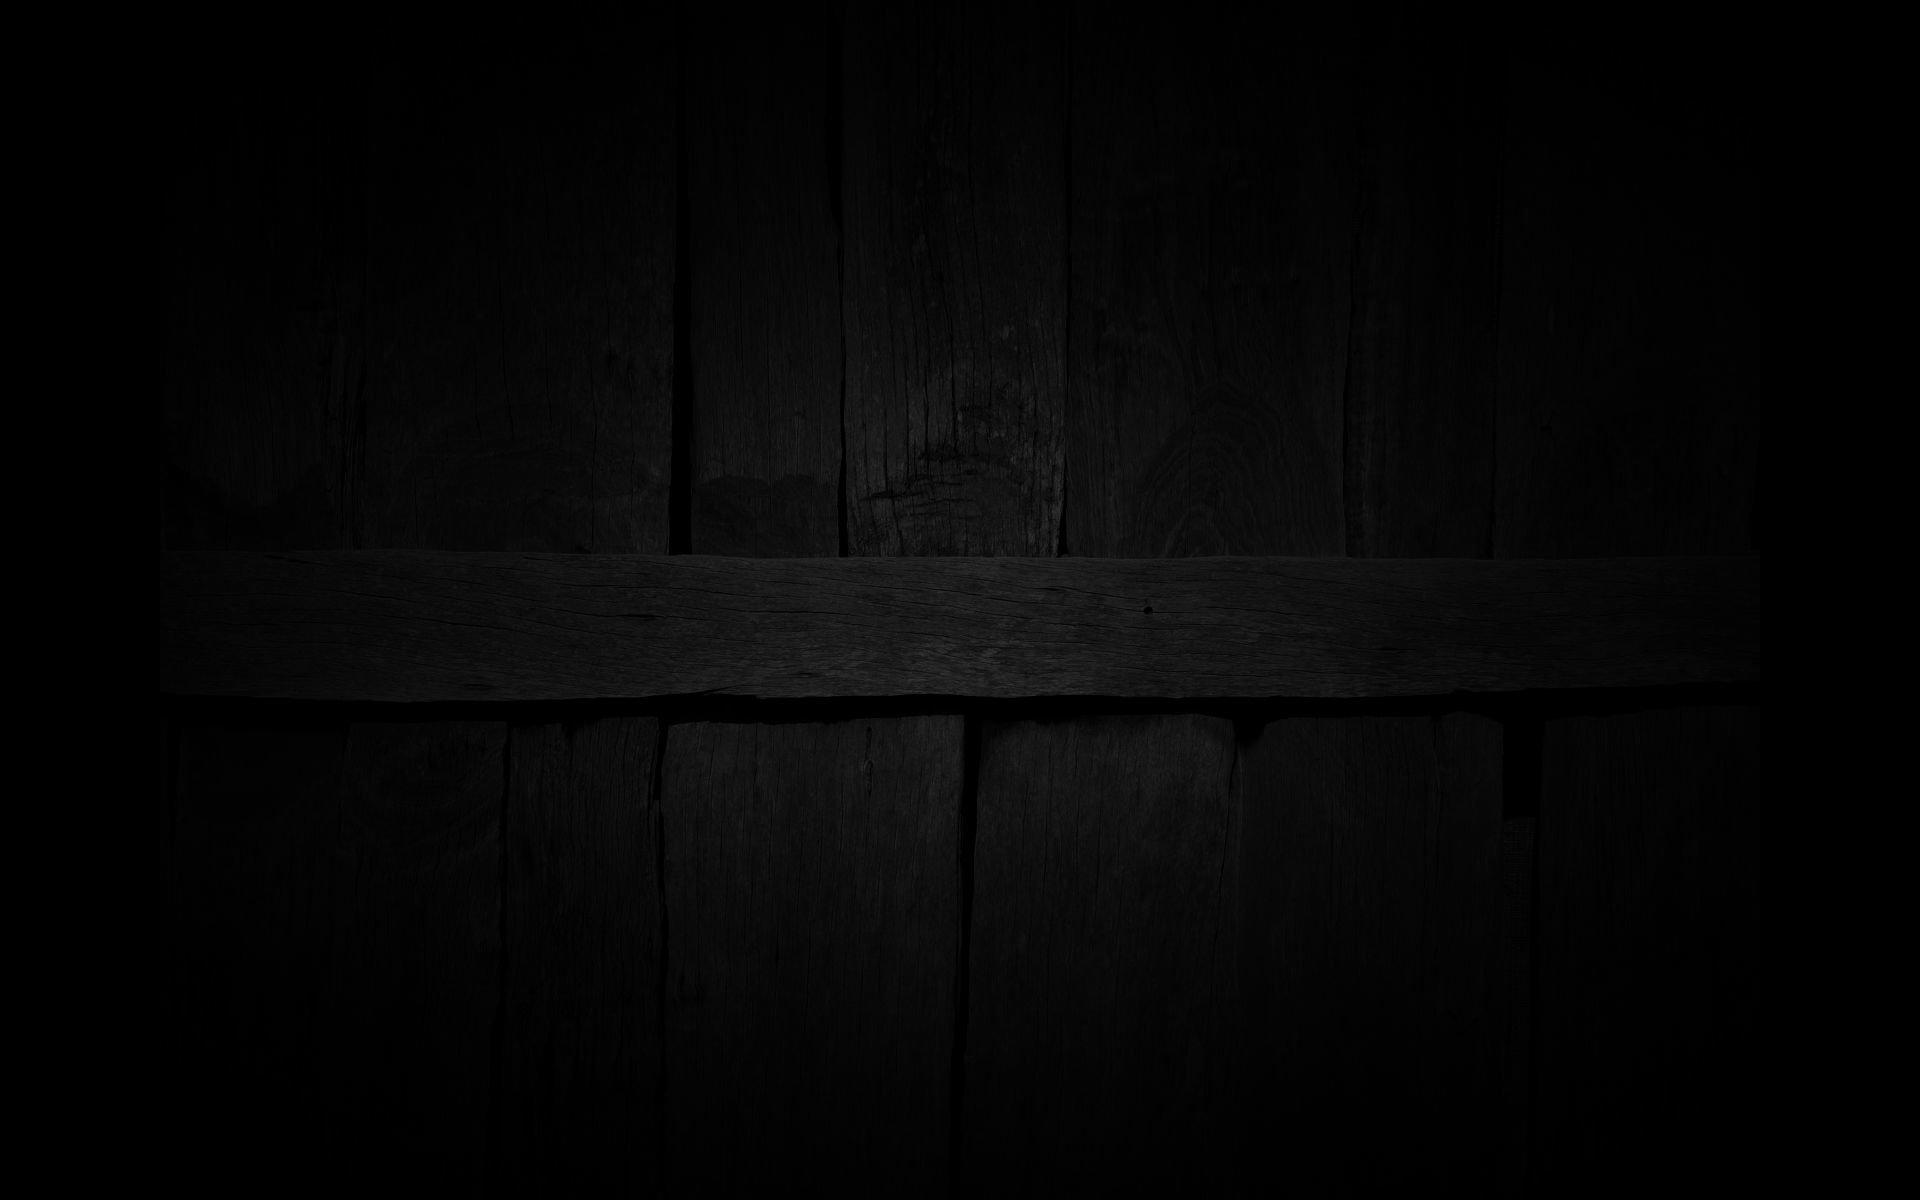 baixar wallpaper fundo preto - photo #14